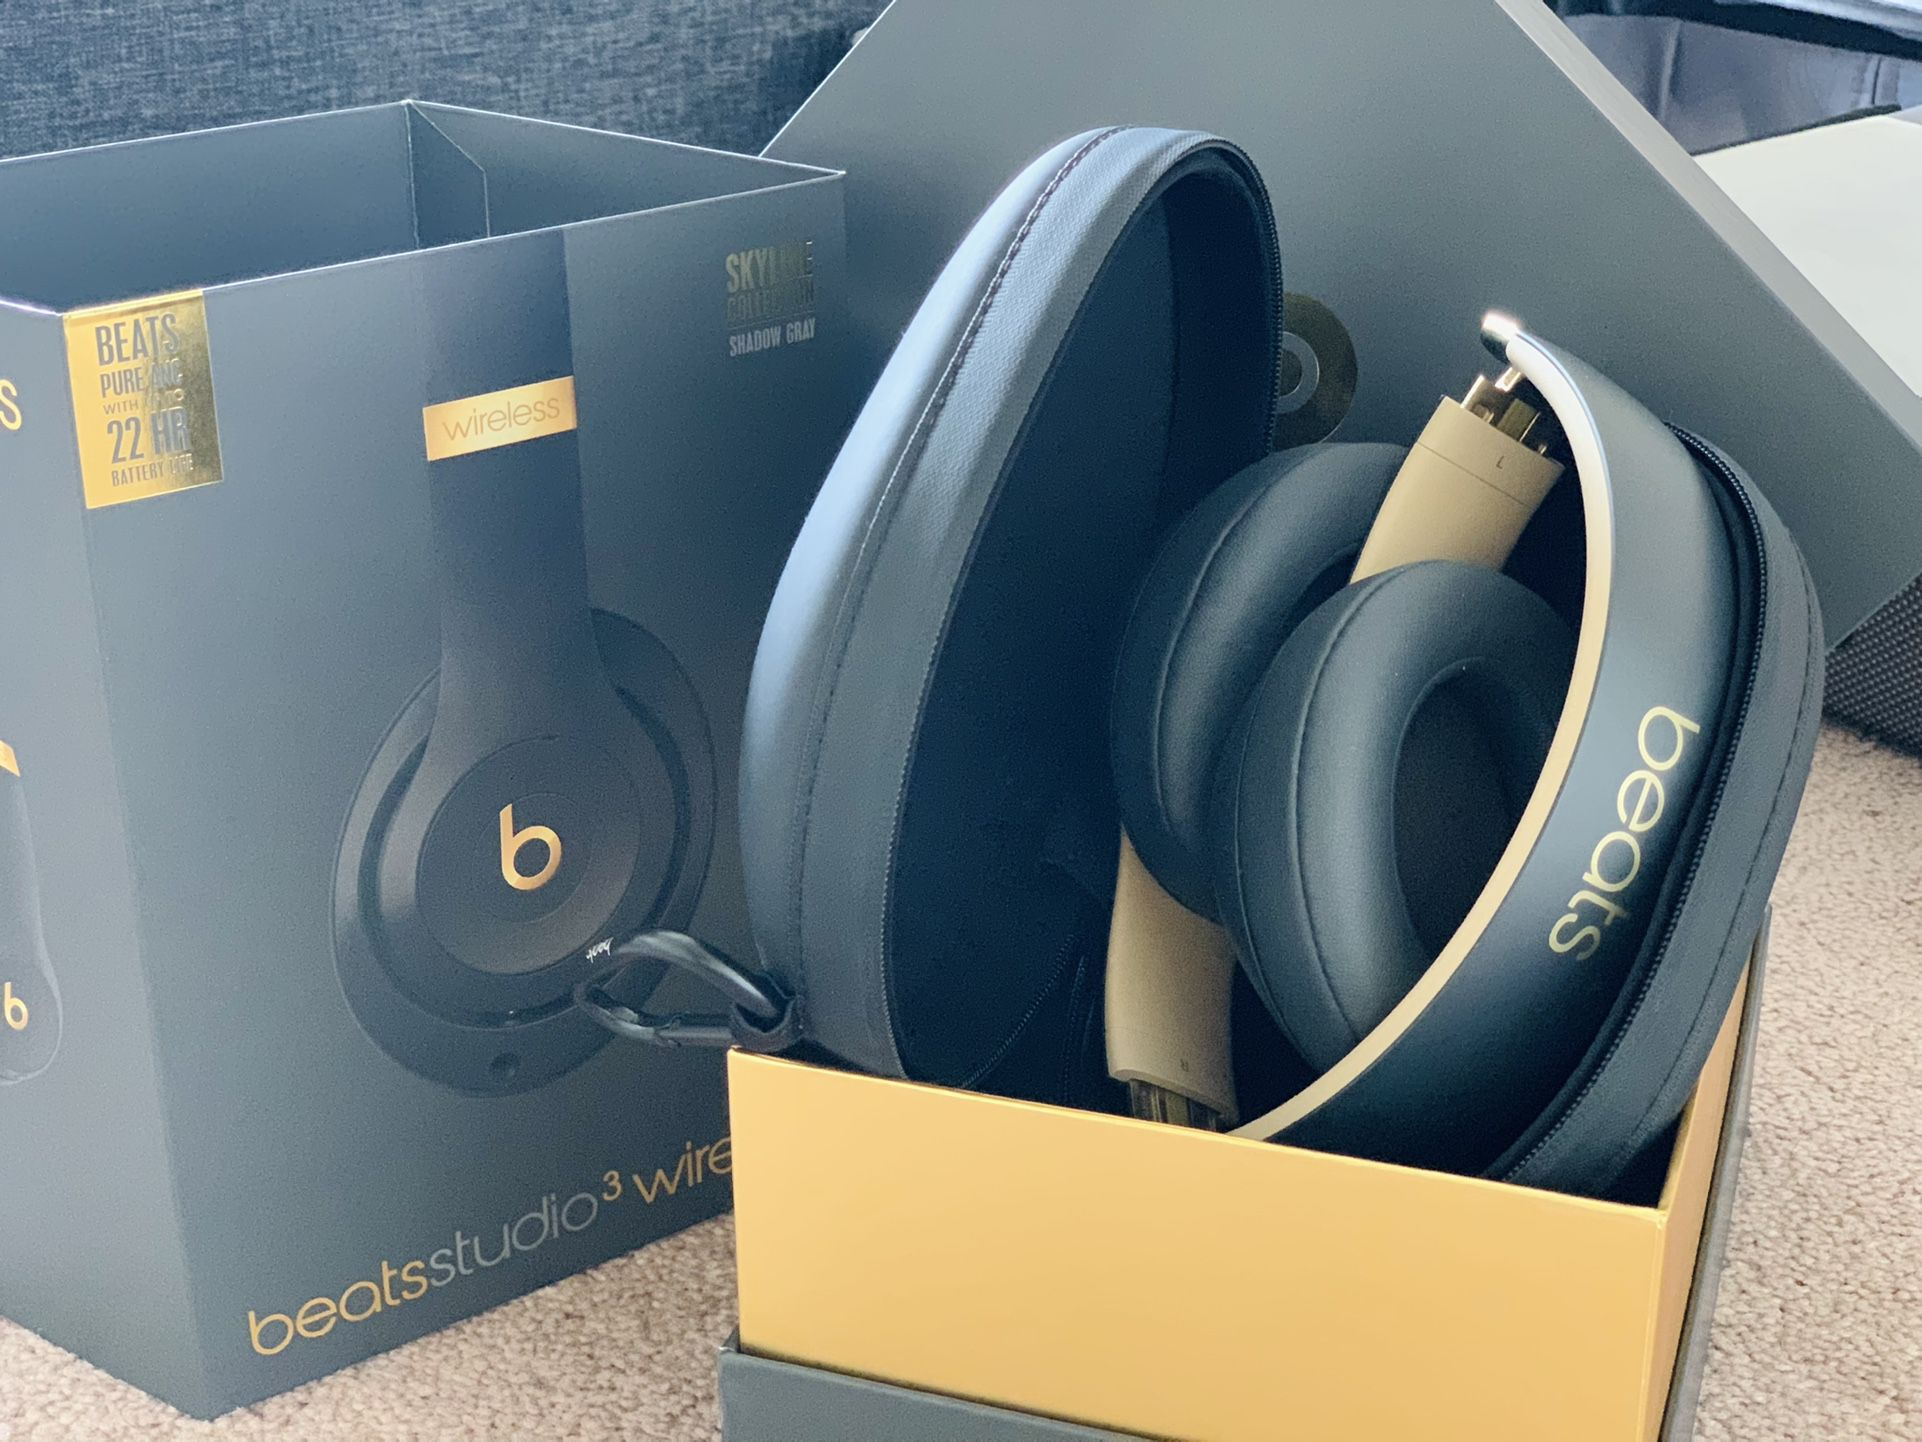 Beats Studio3 Wireless Over-Ear Headphones skyline collection shadow grey